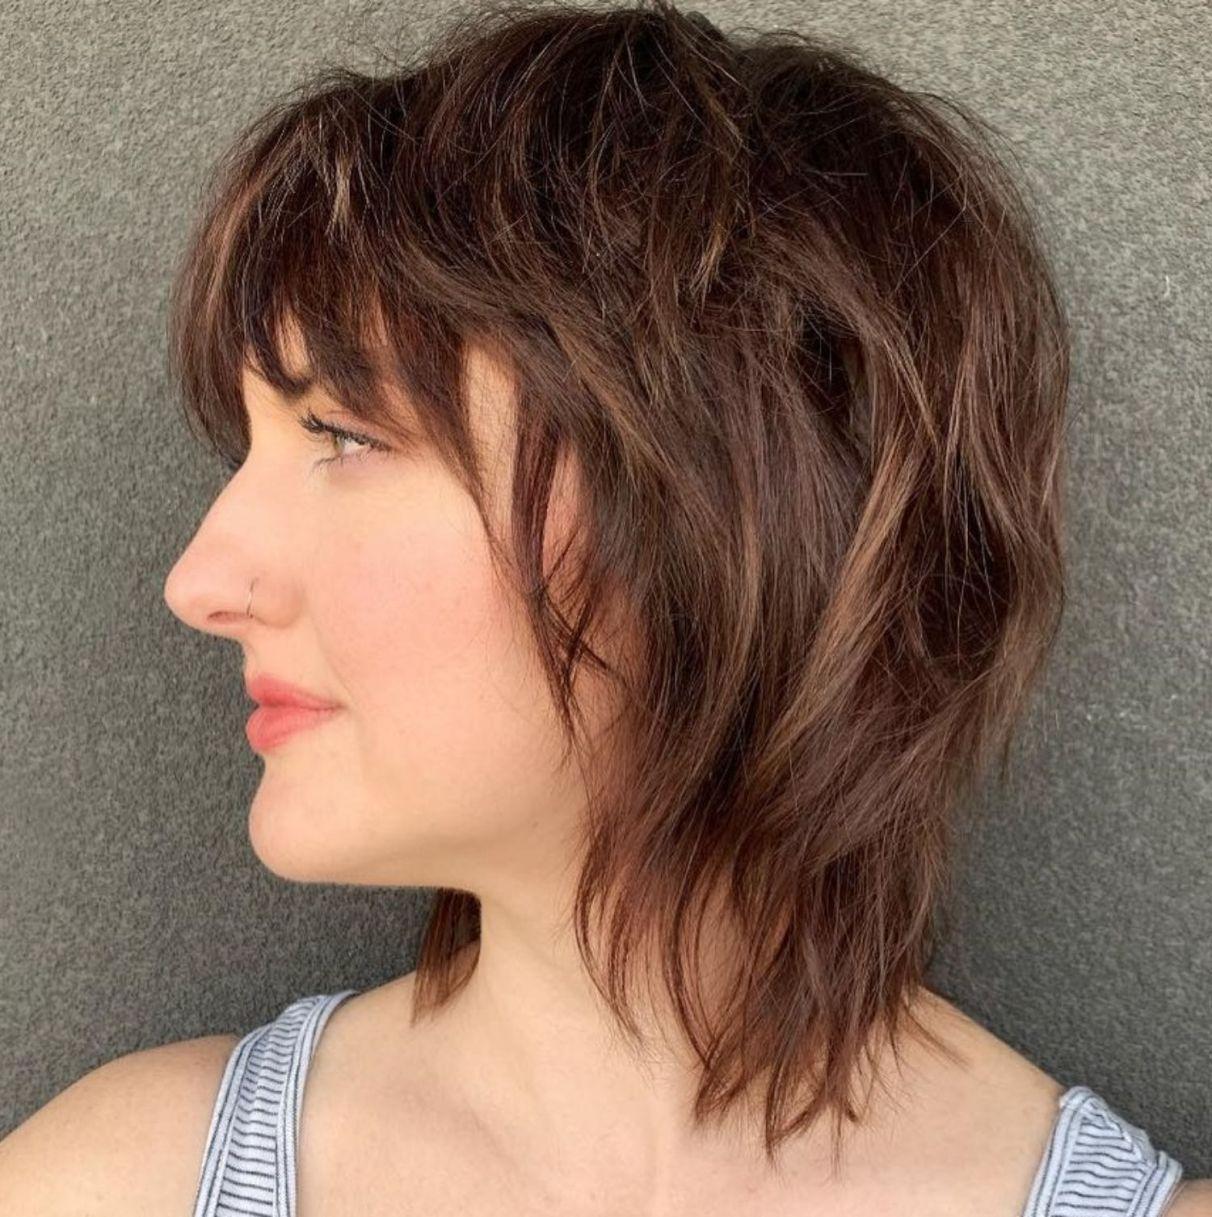 70 Best Variations Of A Medium Shag Haircut For Your Distinctive Style Medium Shag Haircuts Shag Haircut Shaggy Haircuts